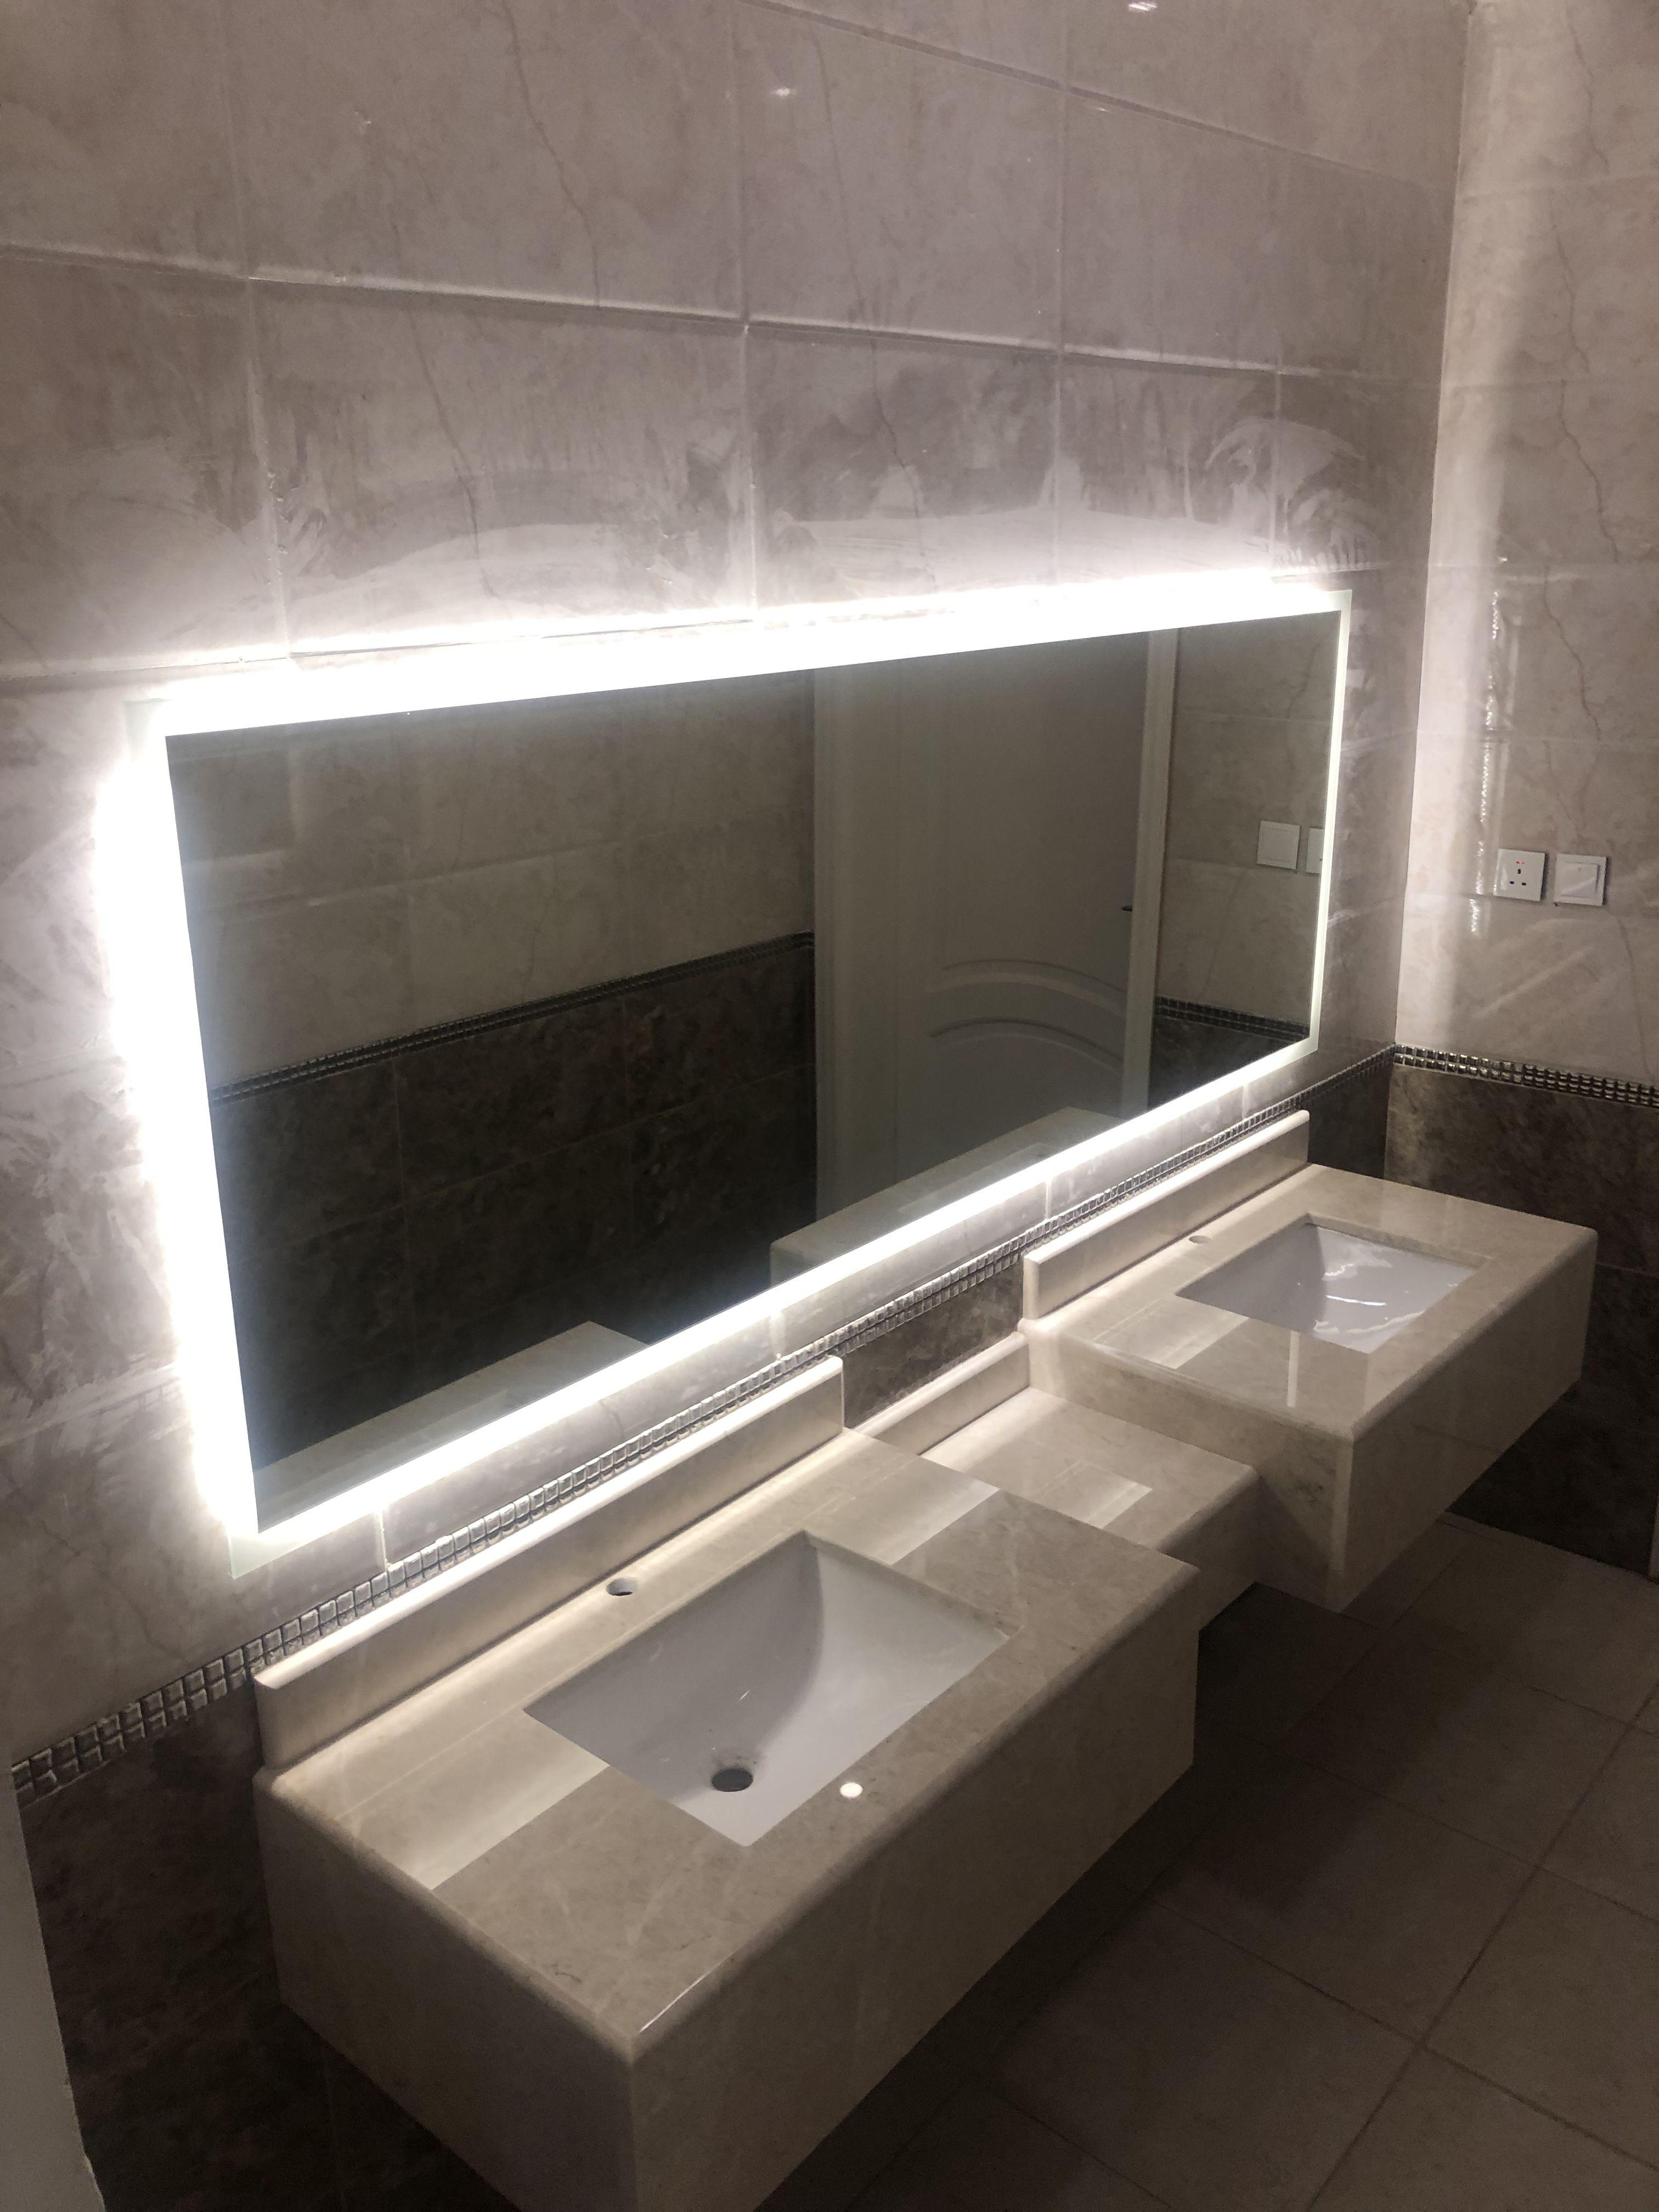 Pin By Mansoor Al On Bathrooms Bathroom Interior Design Kitchen Room Design Room Design